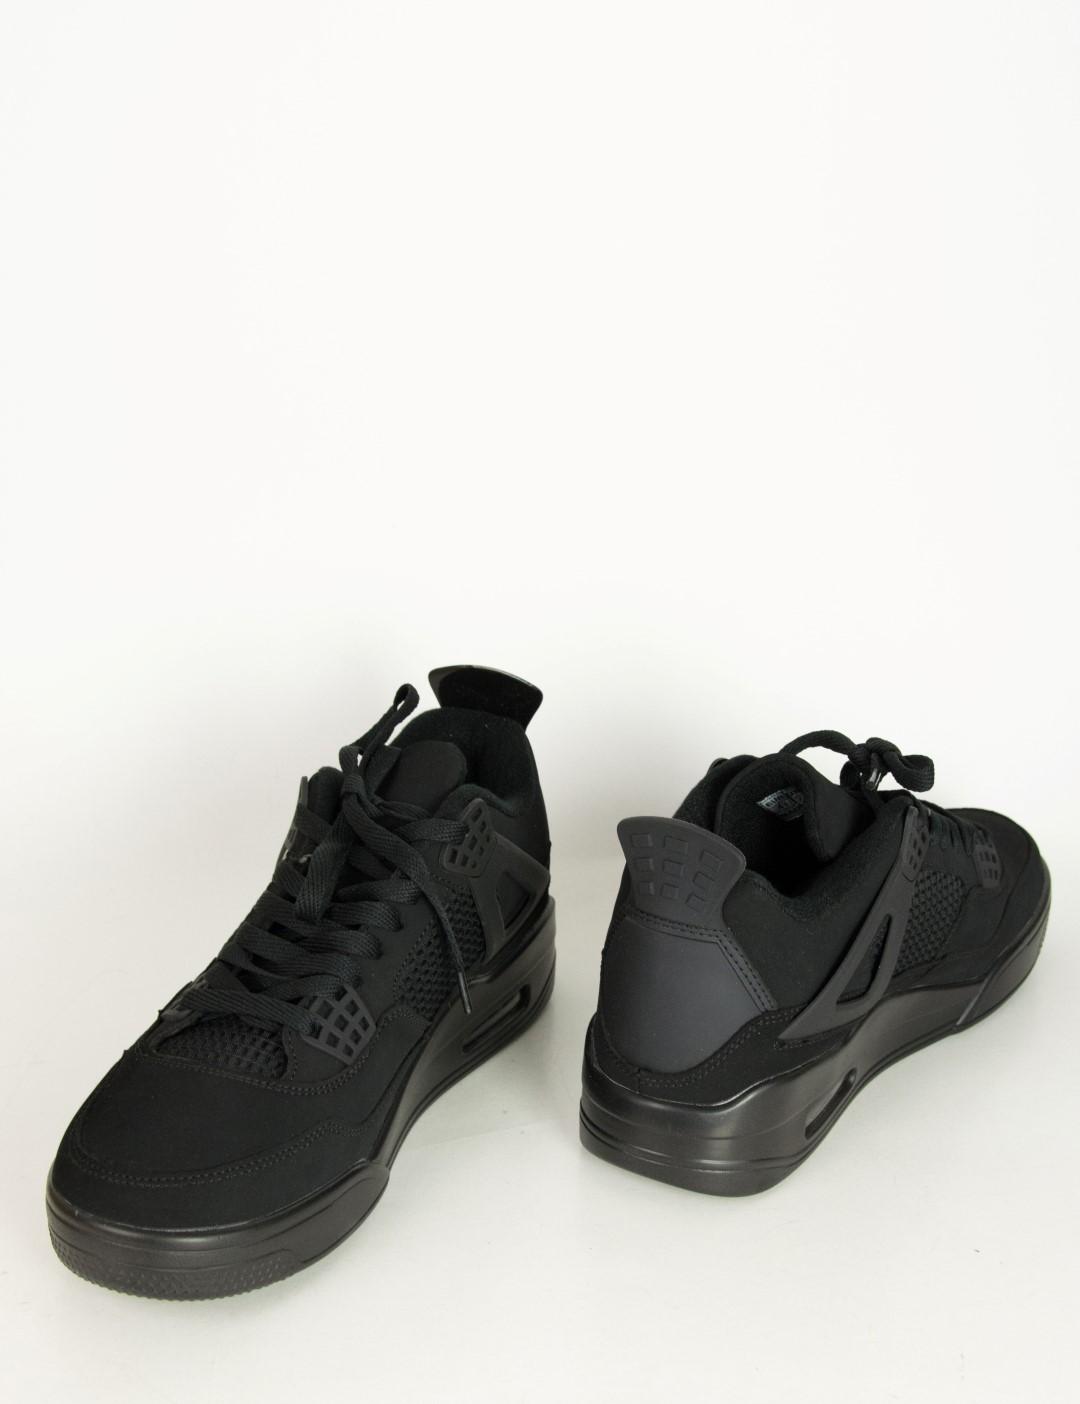 5b7b269cea81 Ανδρικά μαύρα αθλητικά Sneakers με αερόσολα 335812F